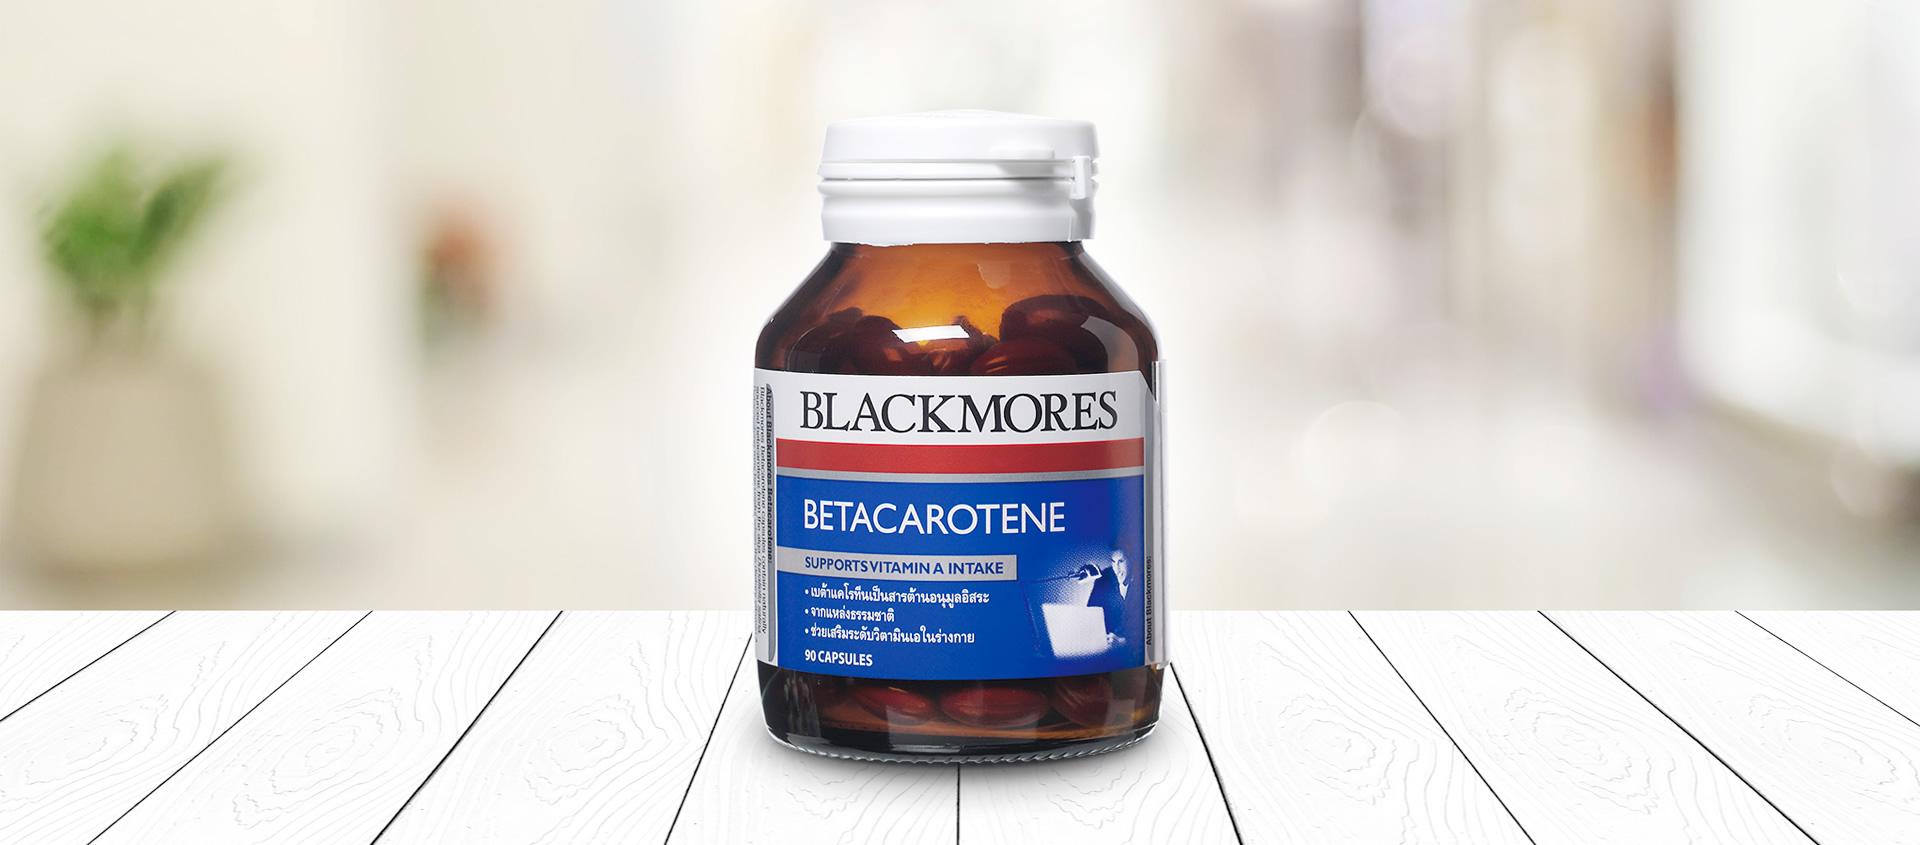 Blackmores Betacarotene แบลคมอร์ส เบต้าแคโรทีน